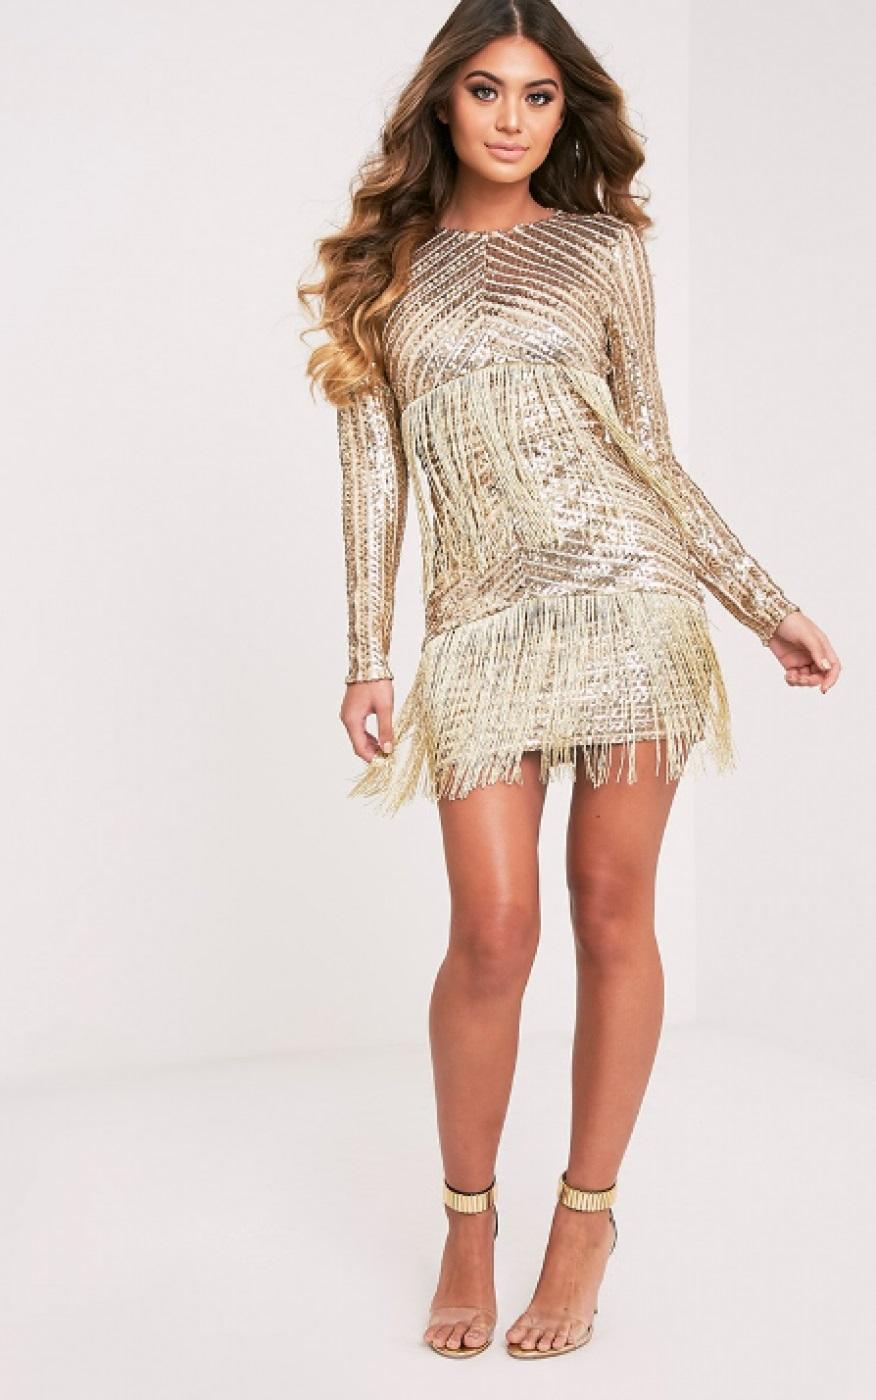 tan-dress-mini-gold-tan-shoe-sandalh-hairr-fall-winter-nye-party-dinner.jpg